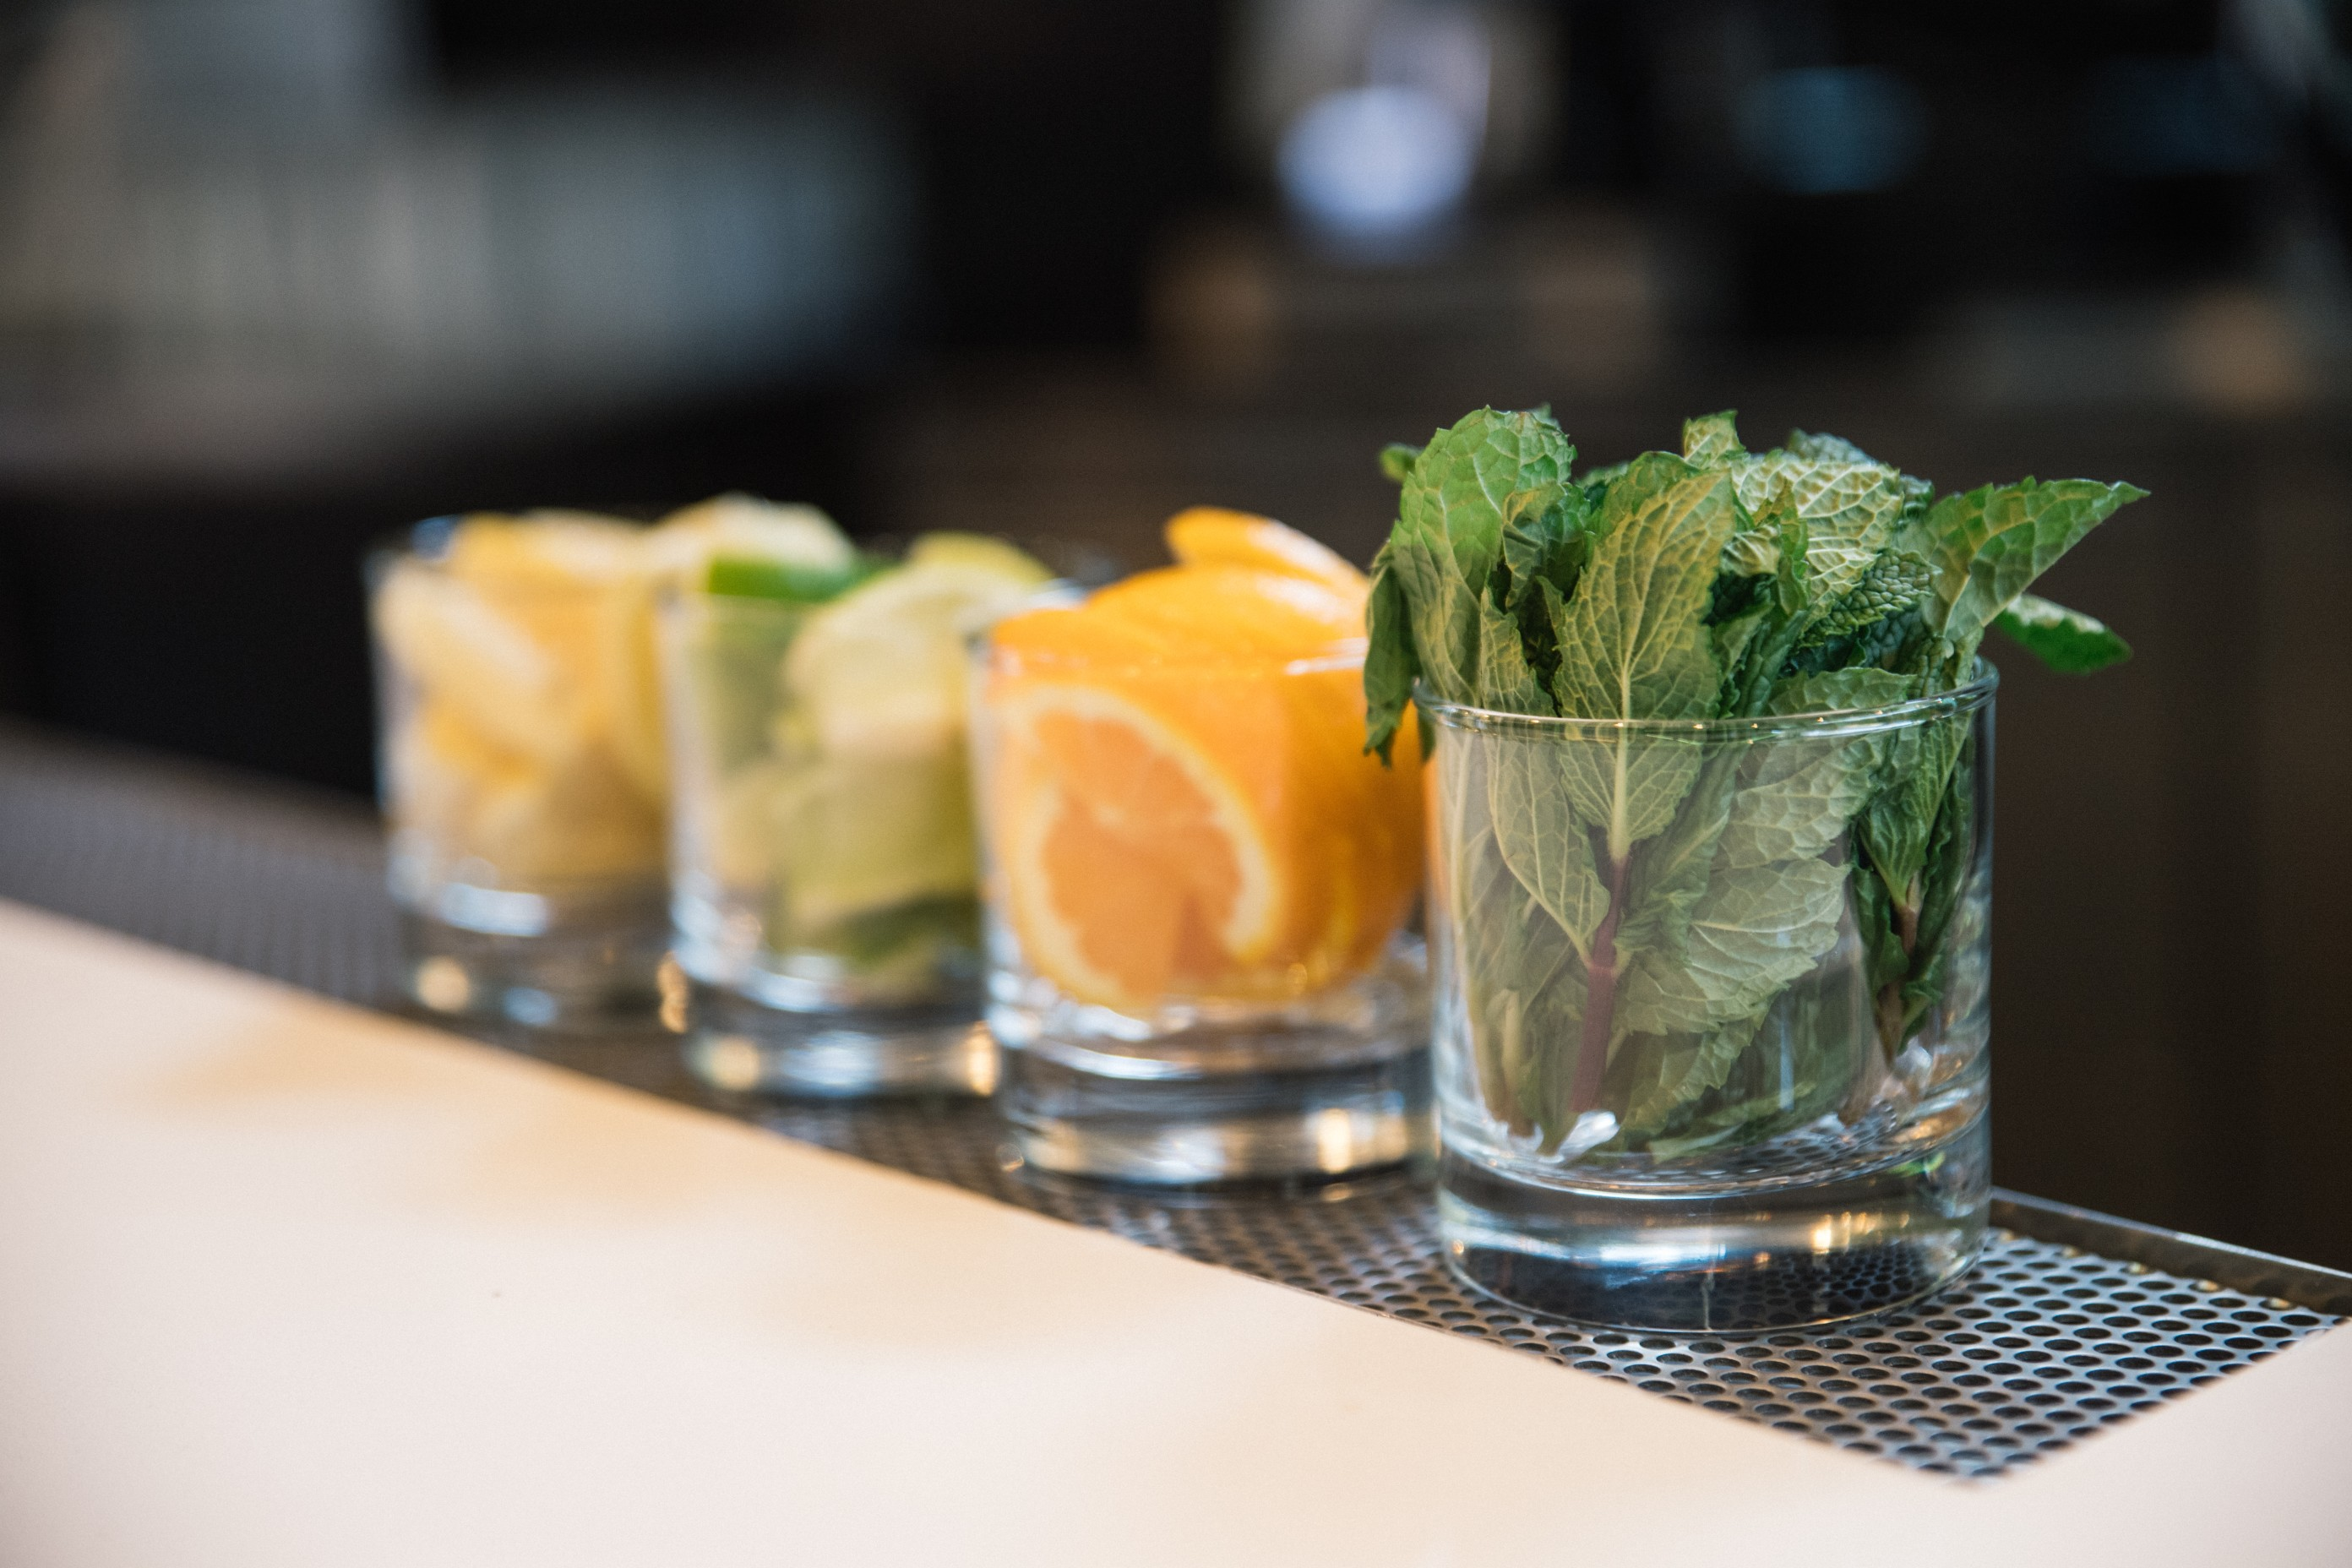 Broccoli City Bar image 1